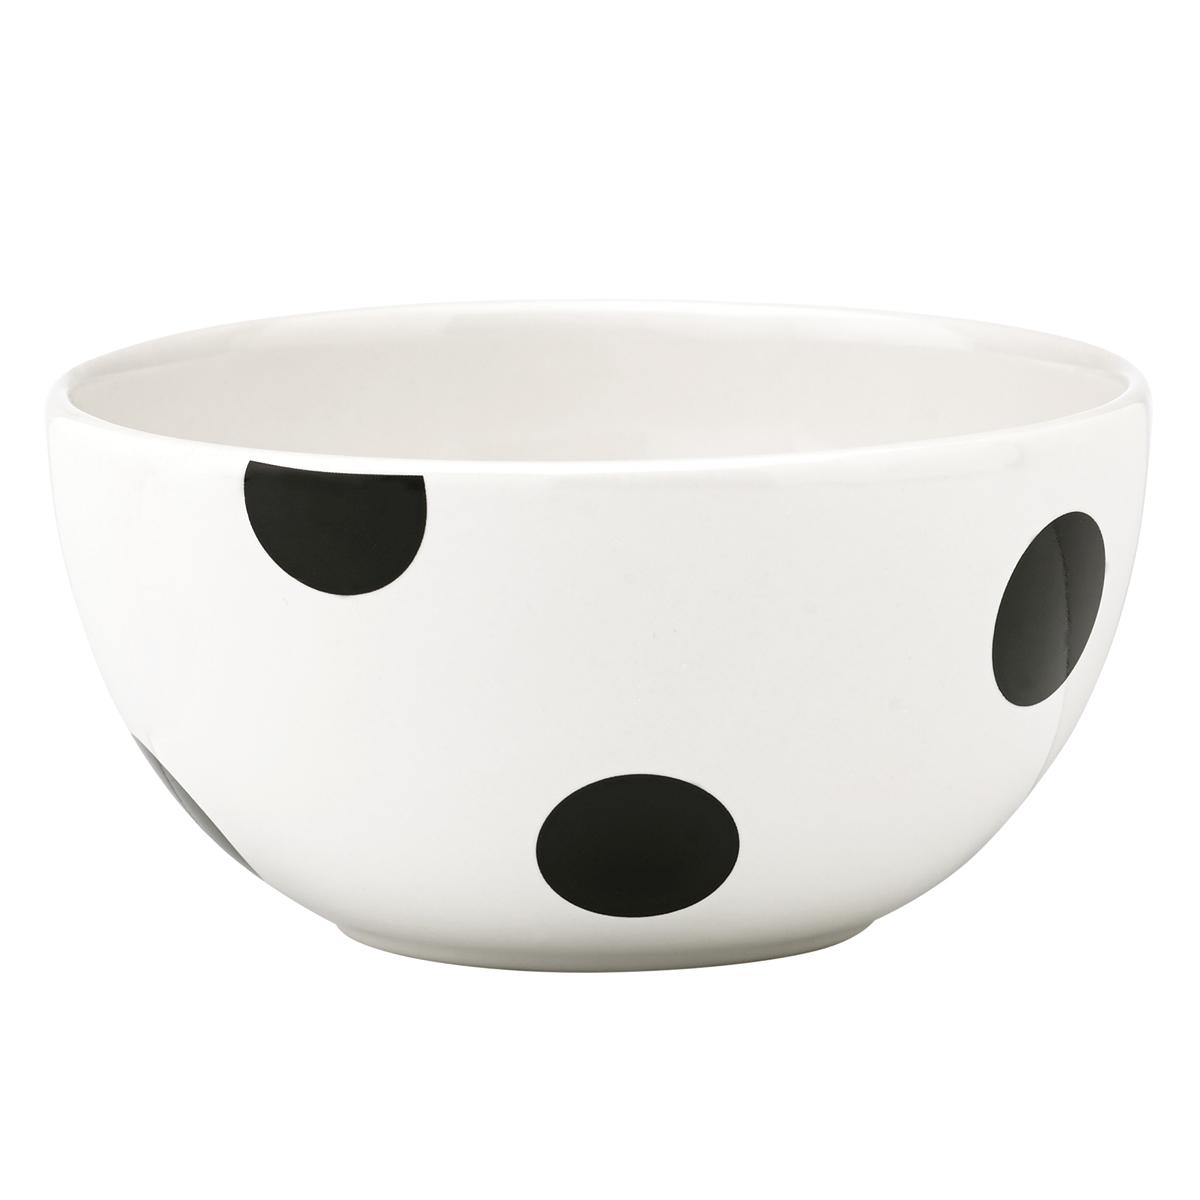 Kate Spade China by Lenox, Deco Dot Fruit Bowl